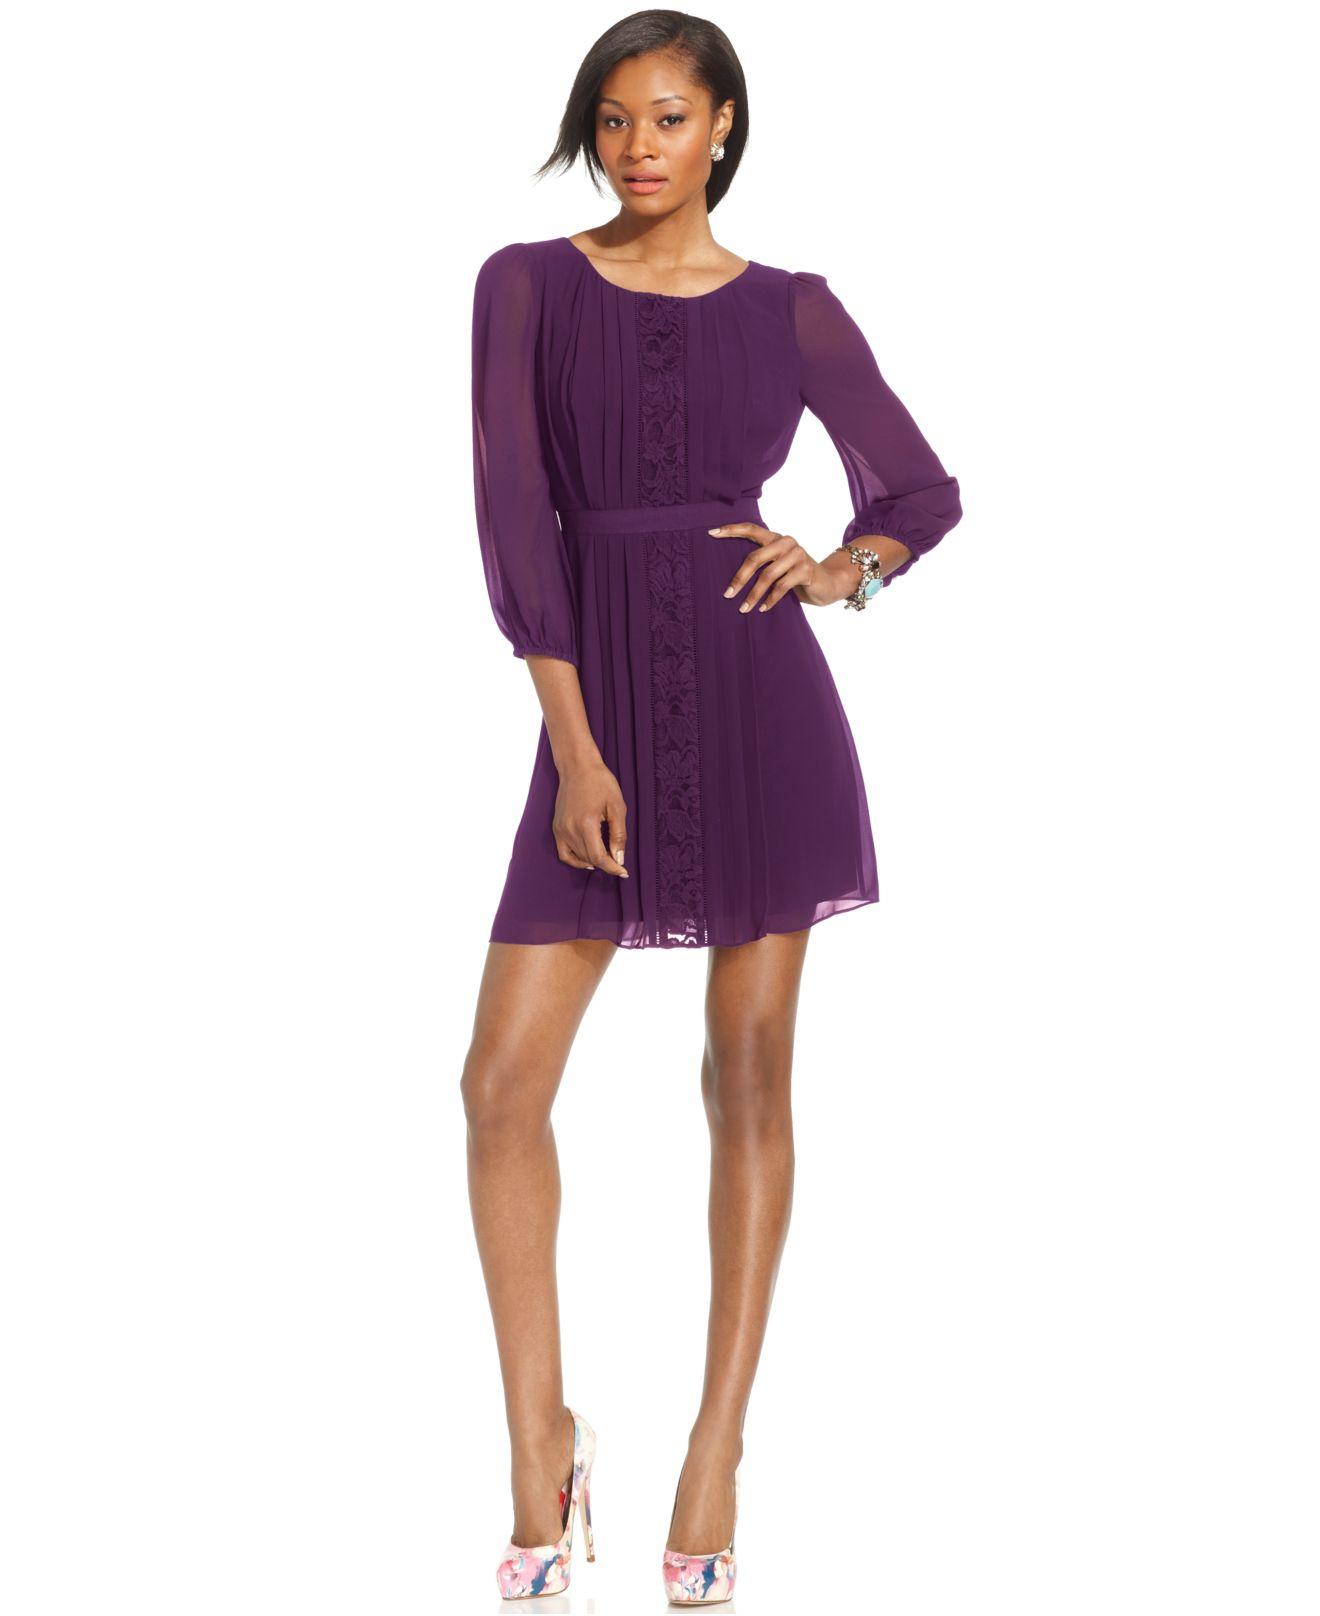 Quarter Sleeve Chiffon Dress